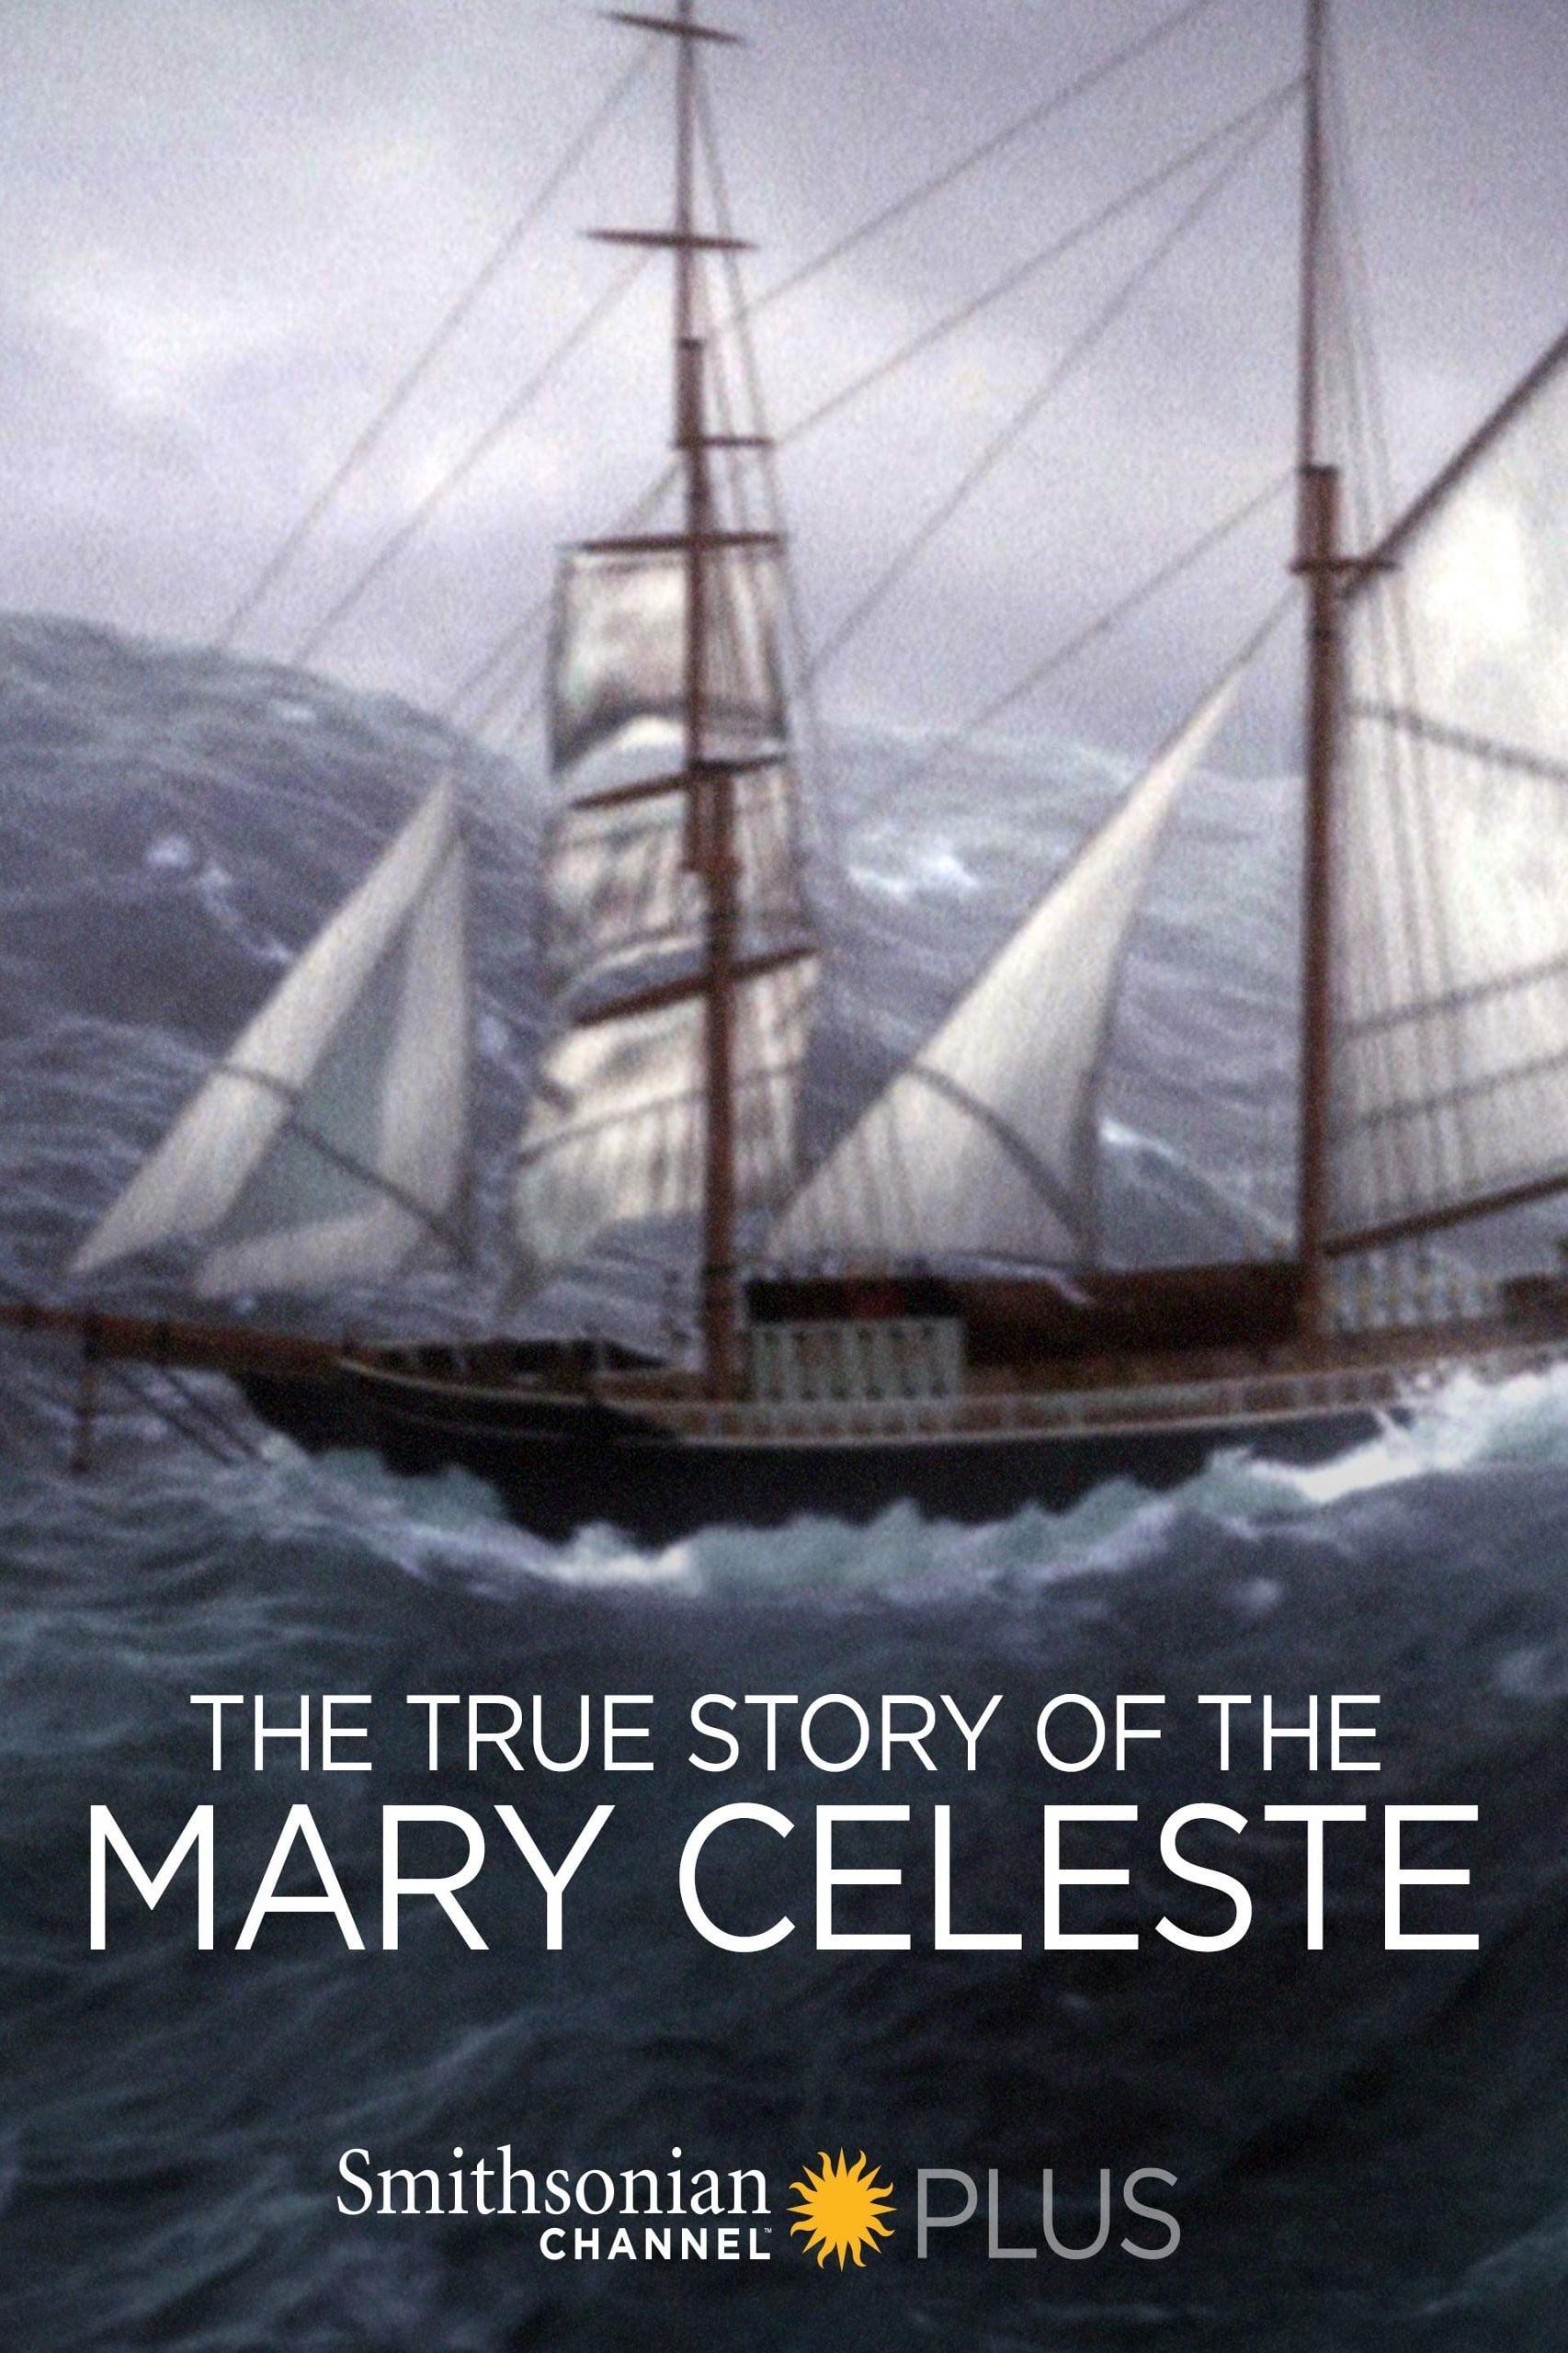 The True Story of the Mary Celeste